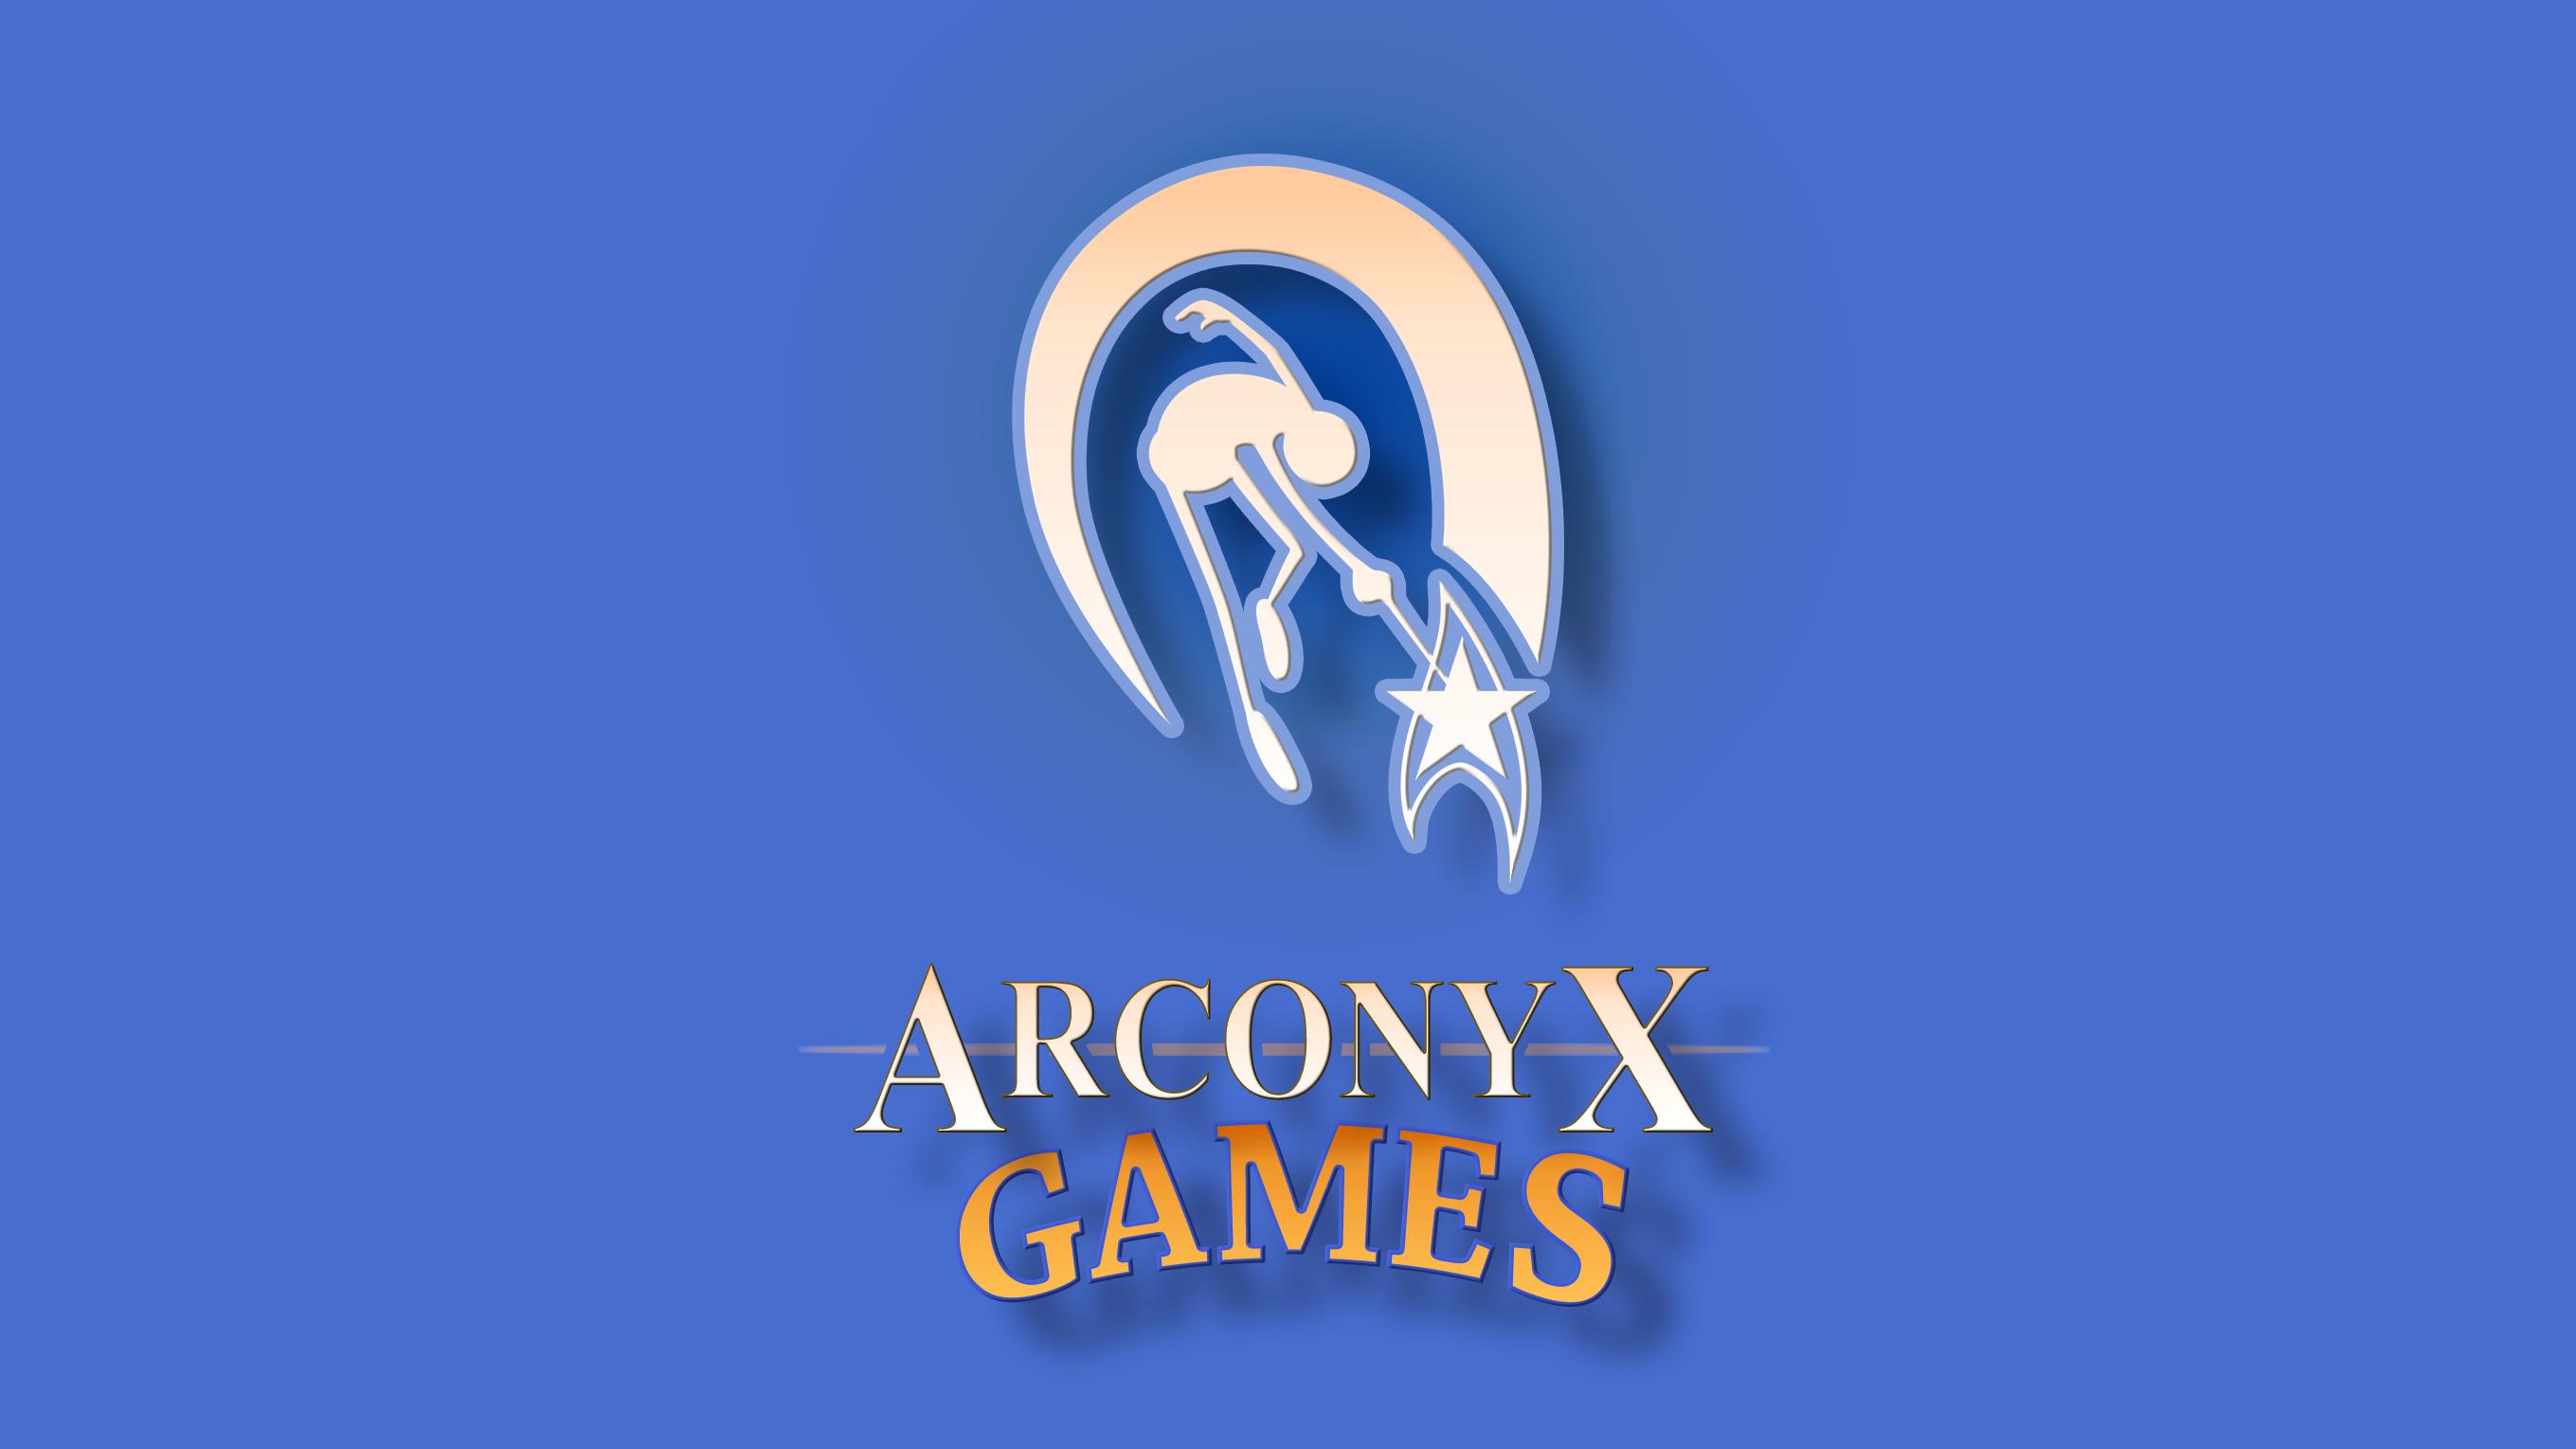 Arconyx Games